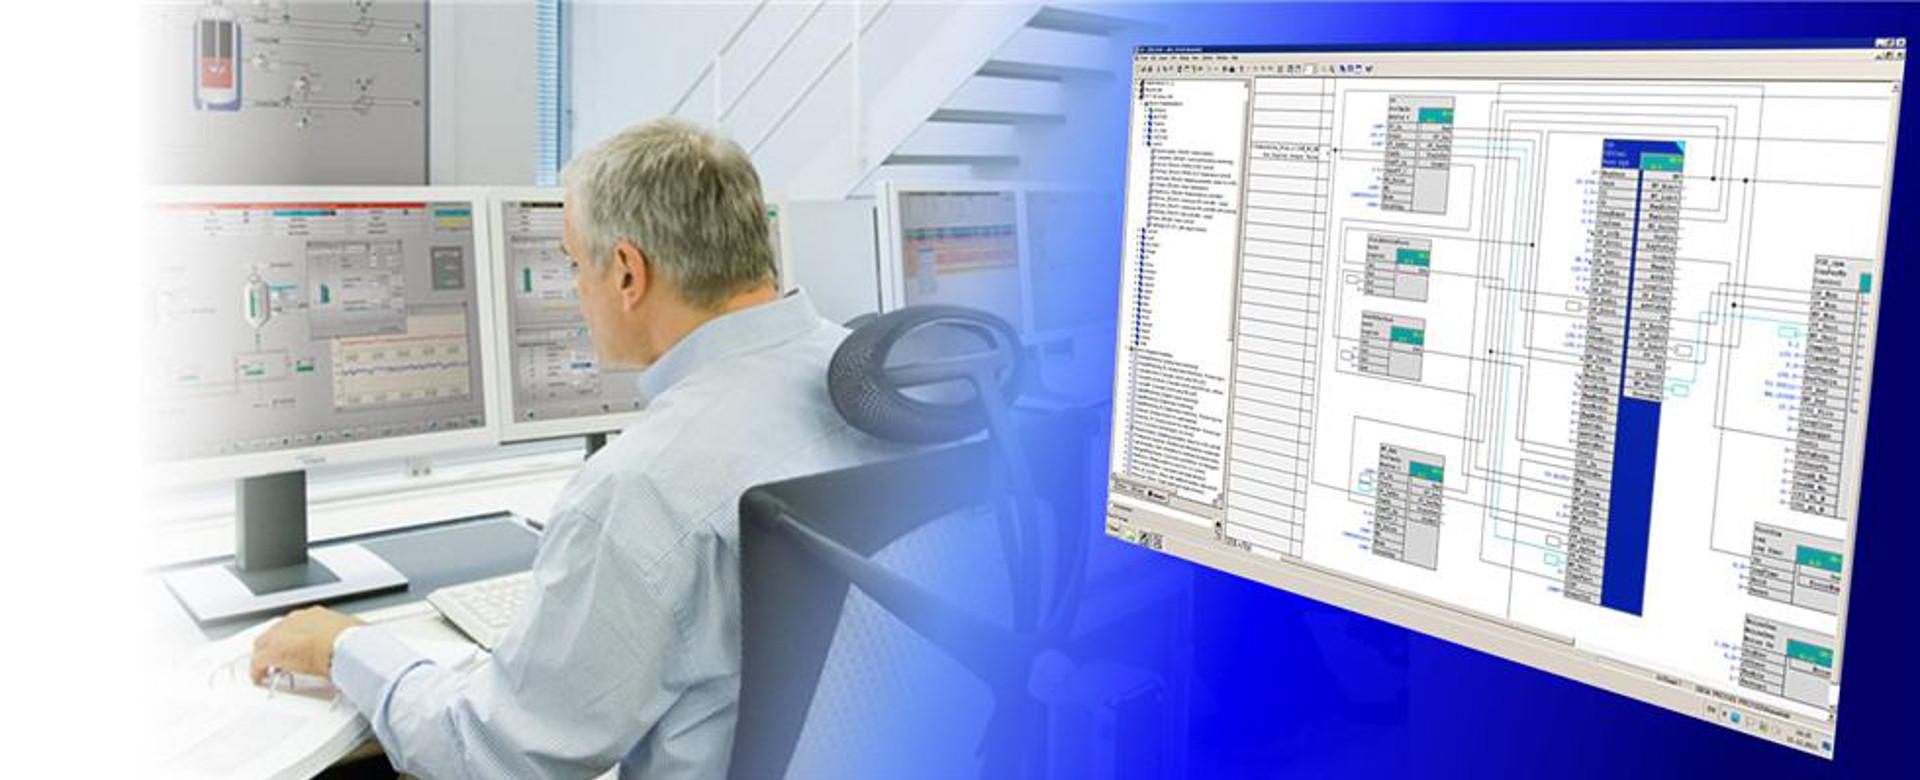 SIMATIC PCS 7 Process Control Room and CFC Chart - SIMATIC PCS 7 BRAUMAT